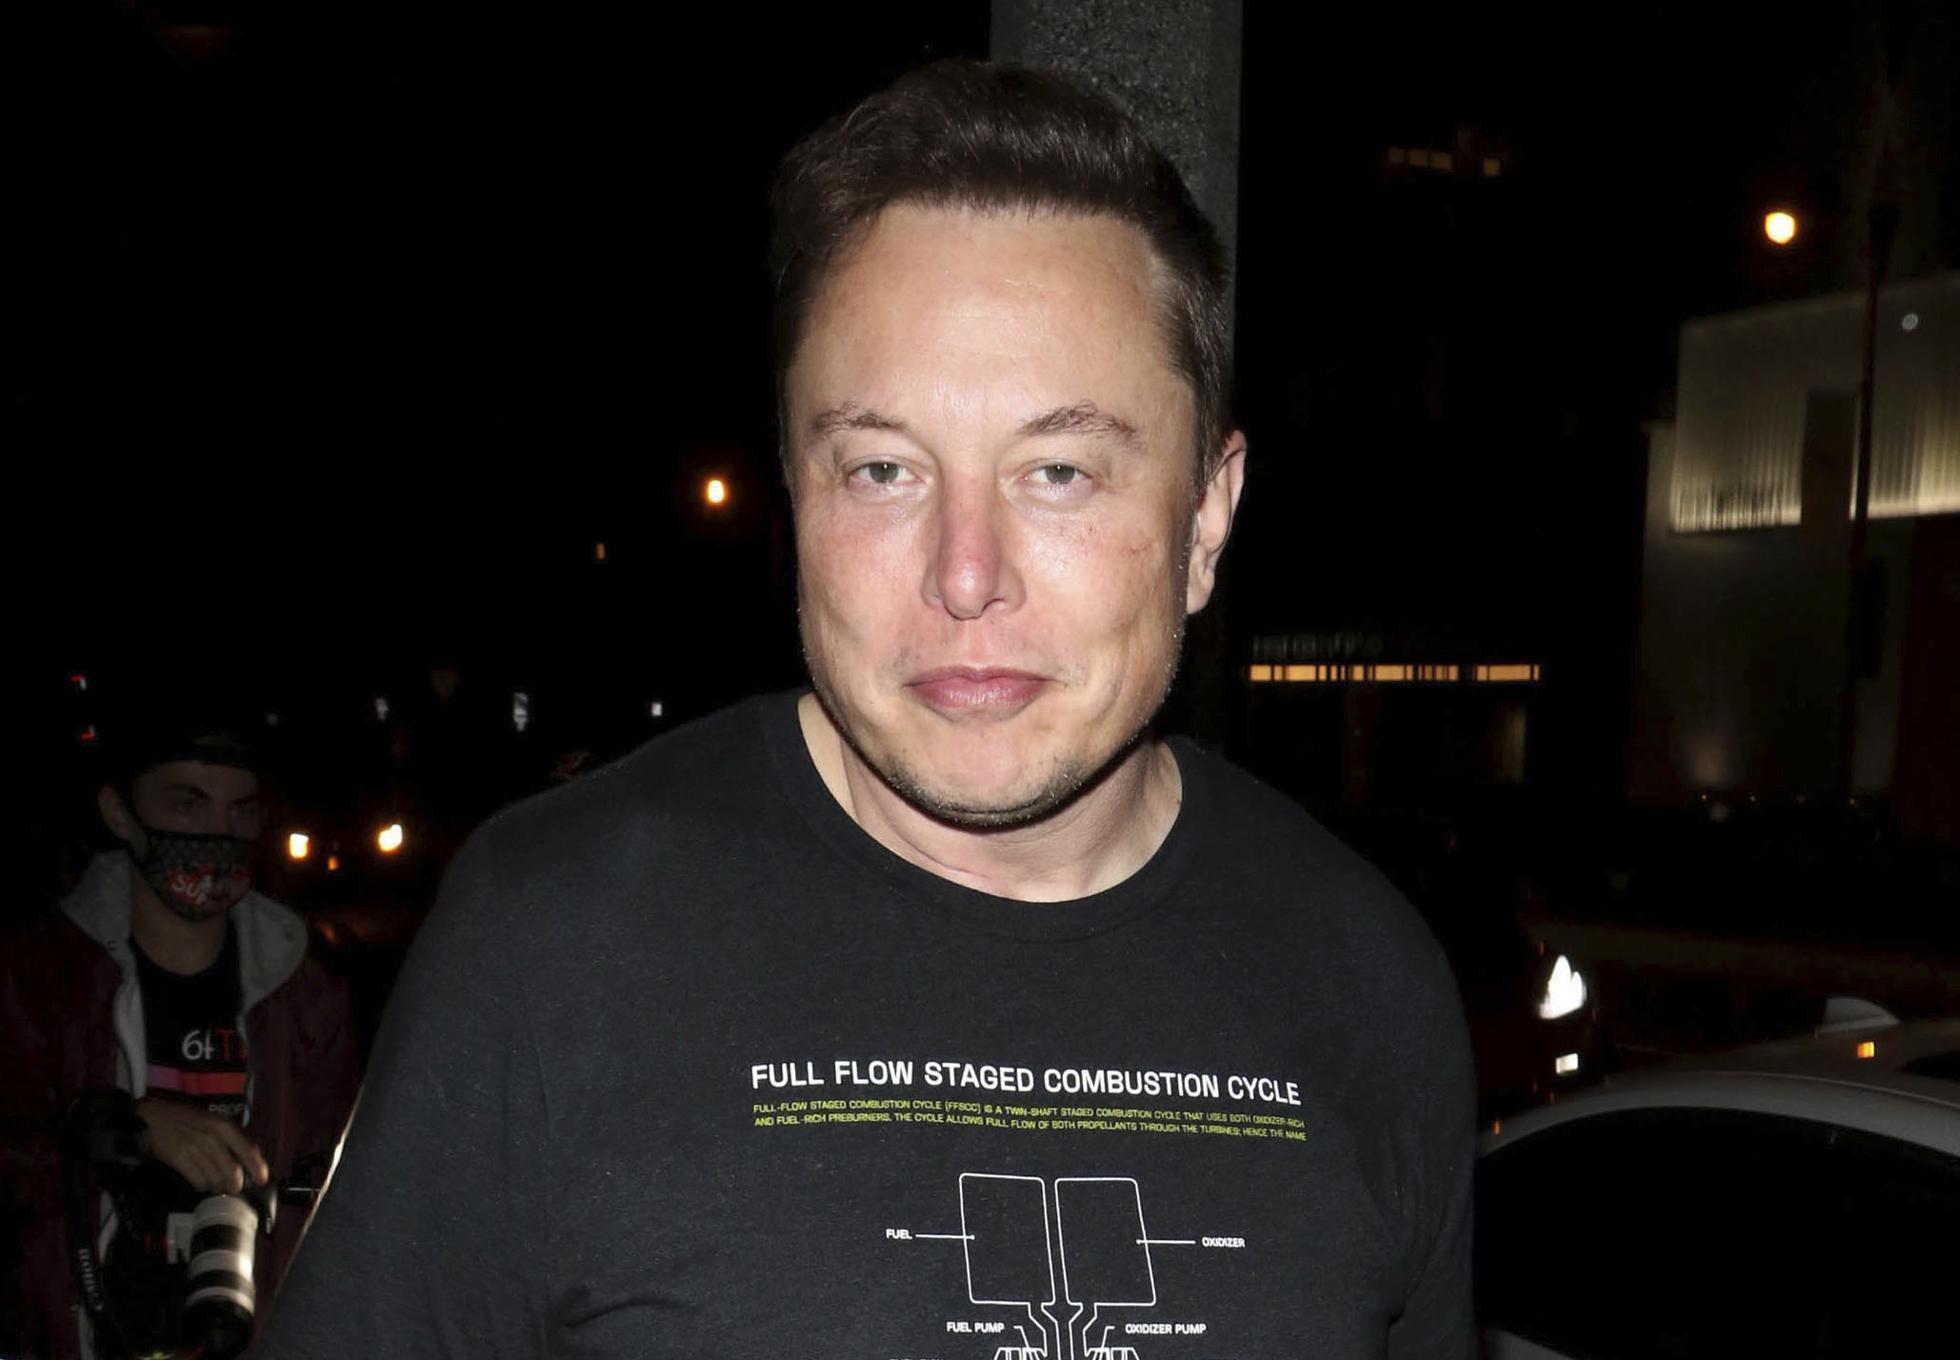 Elon-Musk-Bitcoin-Tesla